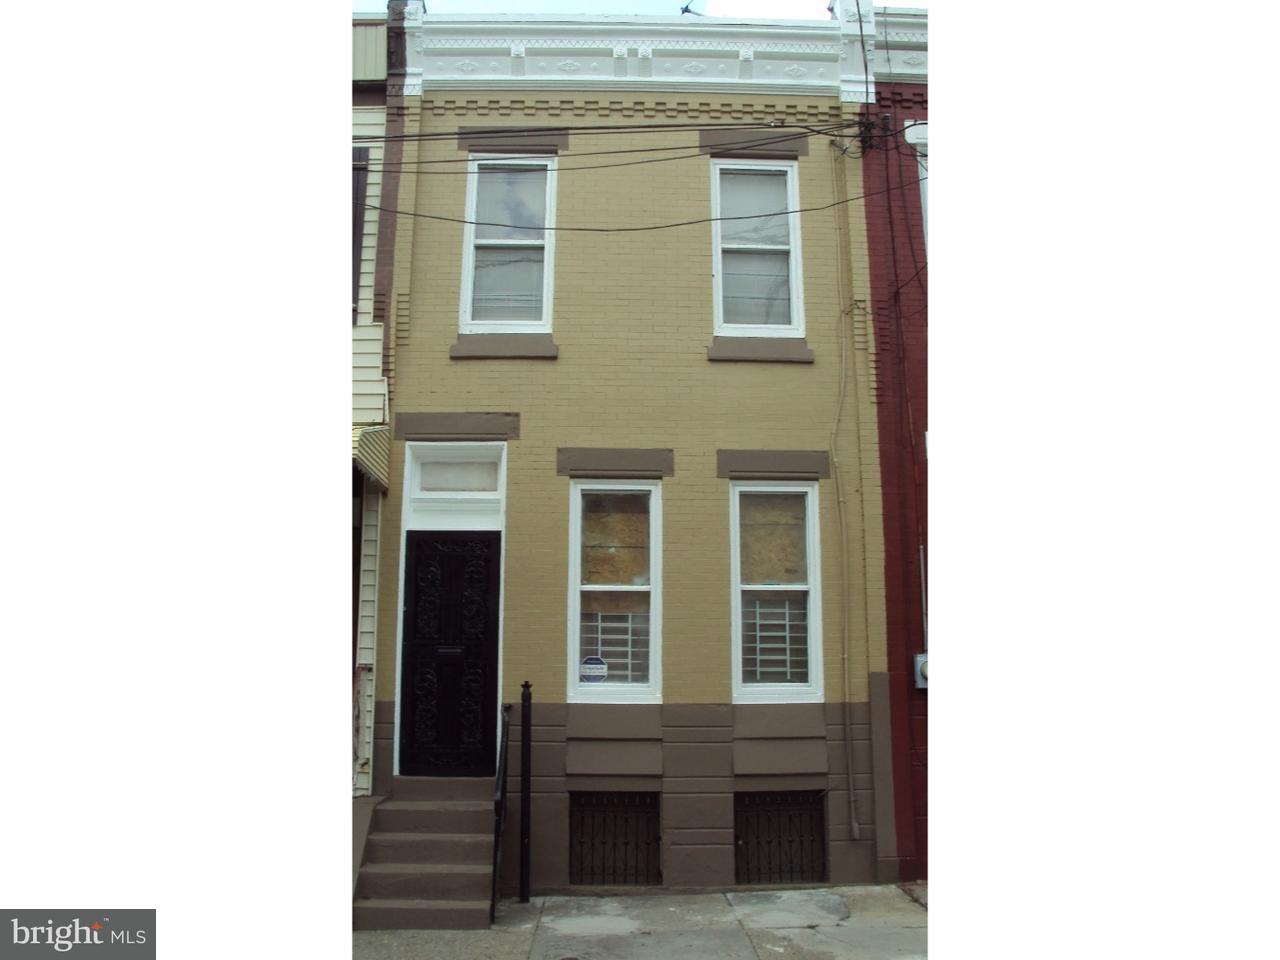 2455 N Opal Philadelphia, PA 19132